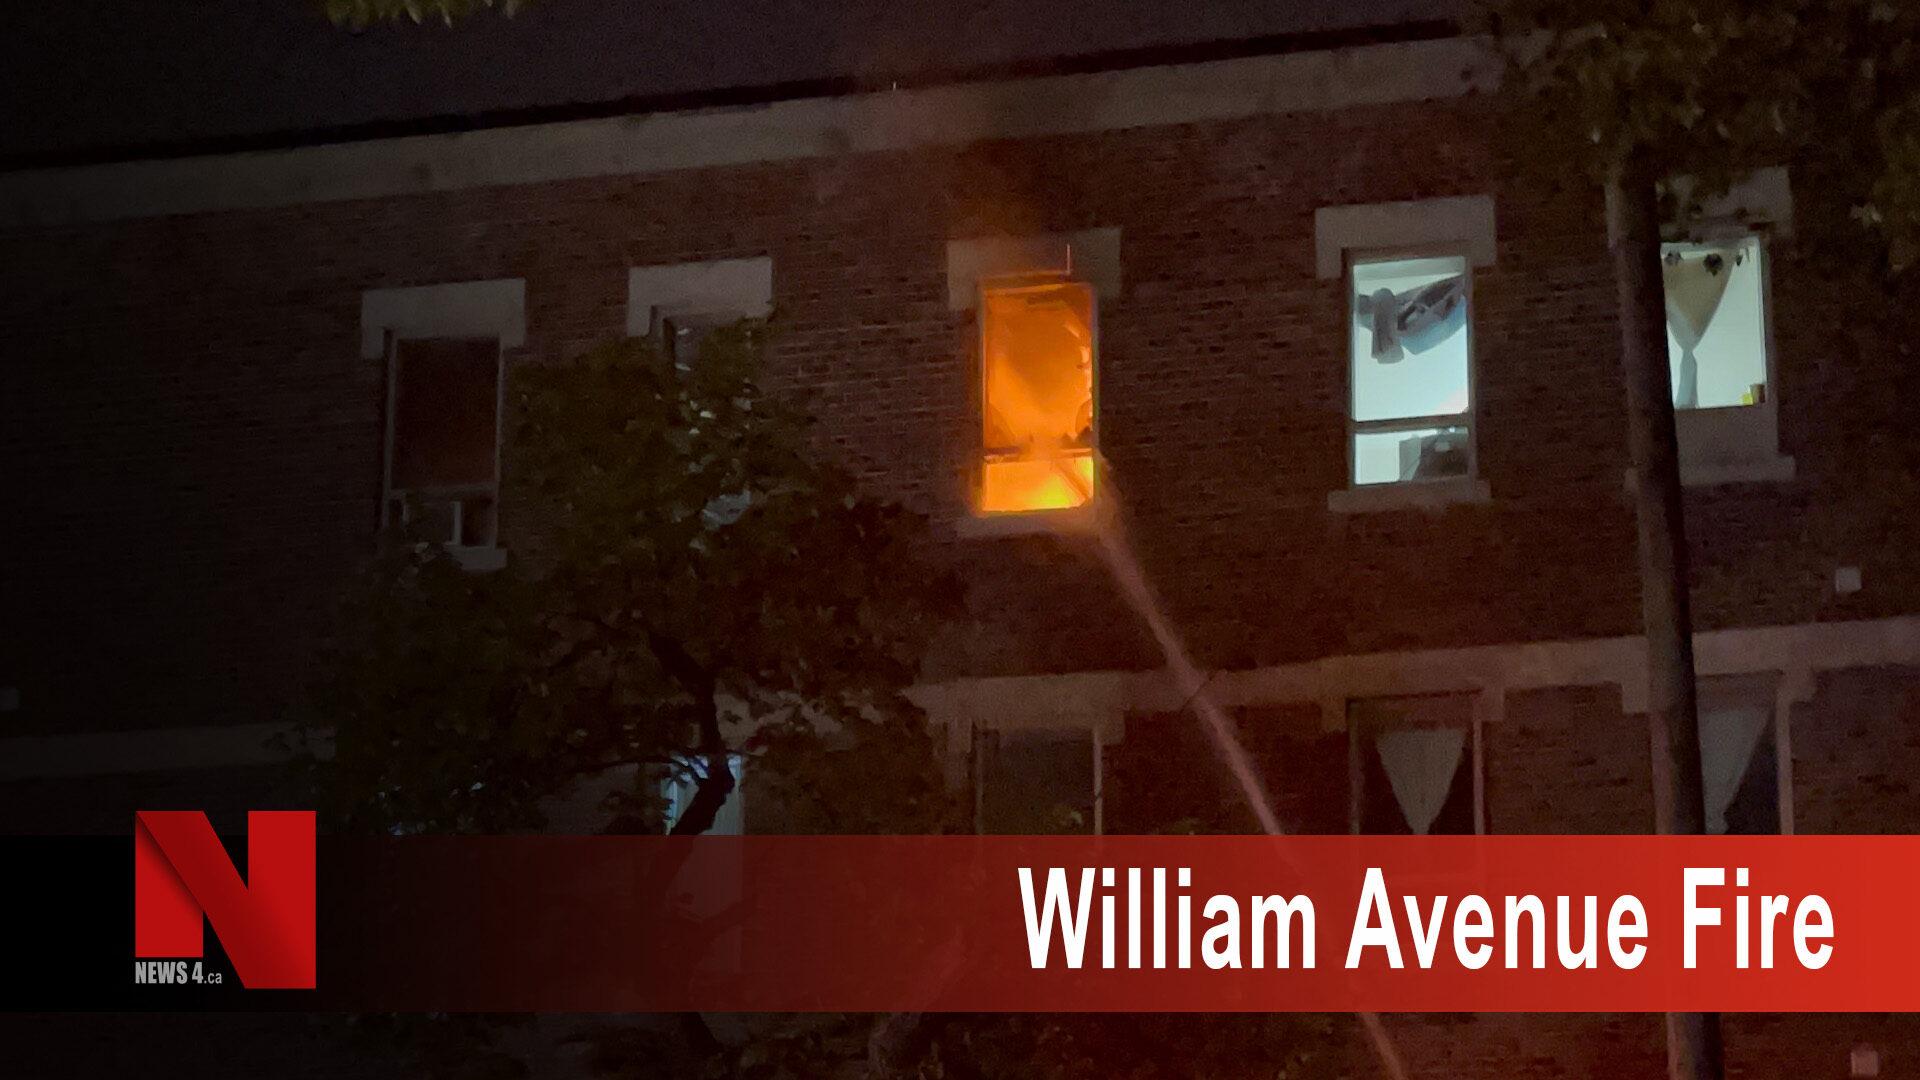 William Avenue Fire